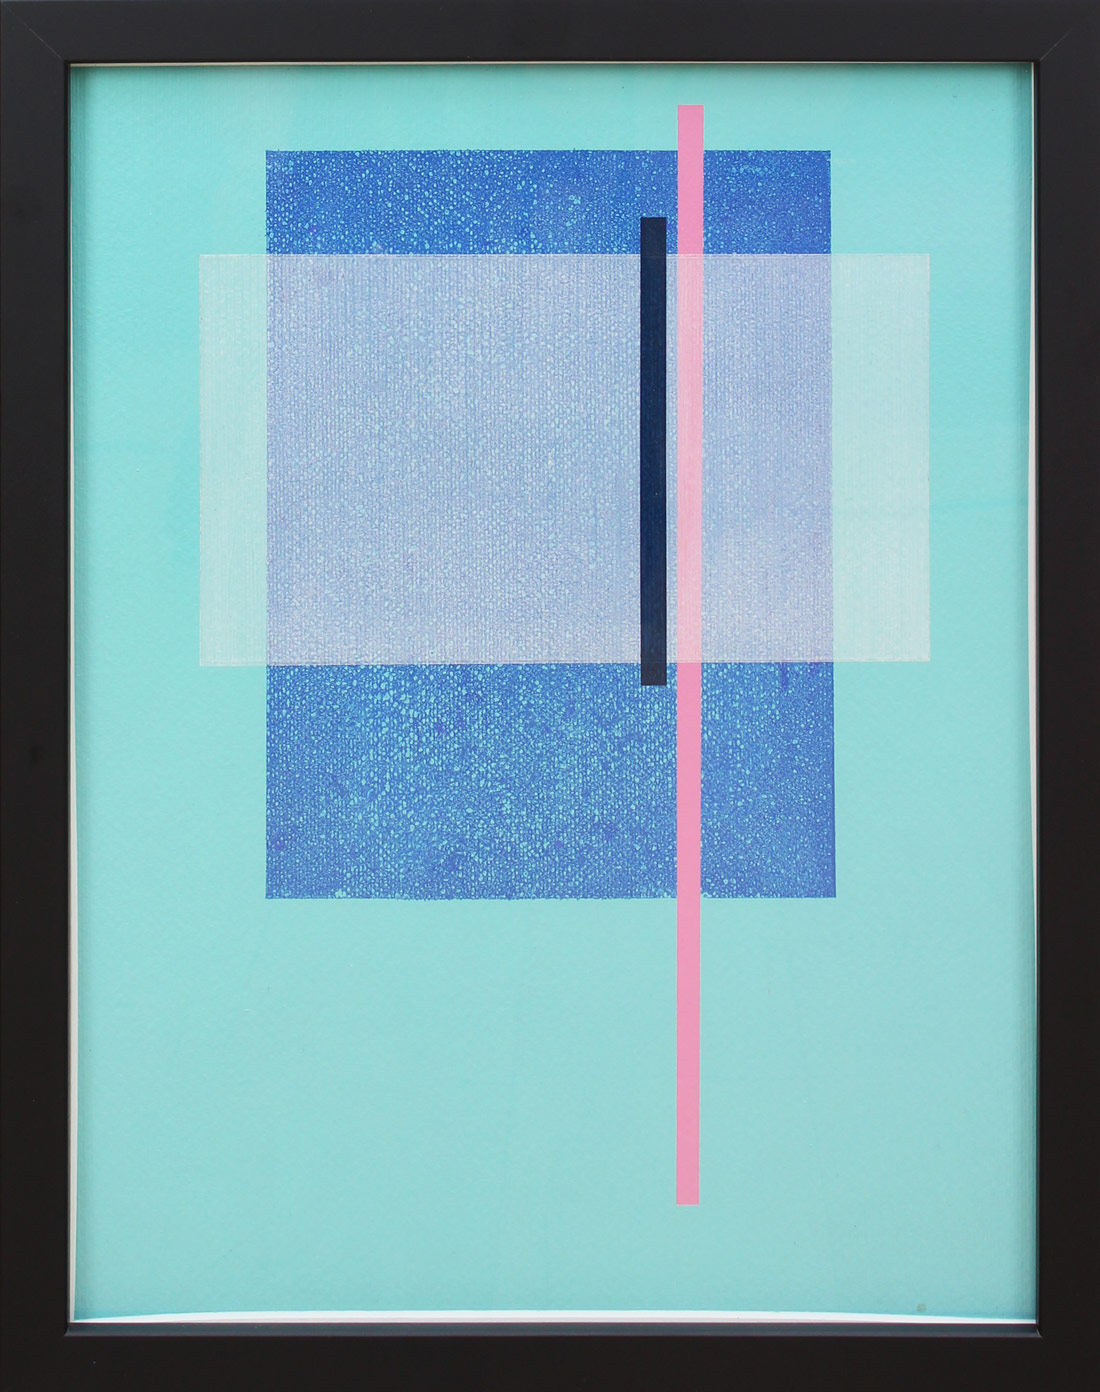 Sans-Titre-(fond-turquoise,-rectangle-bleu-et-blanc,-barre-rose)-packshot